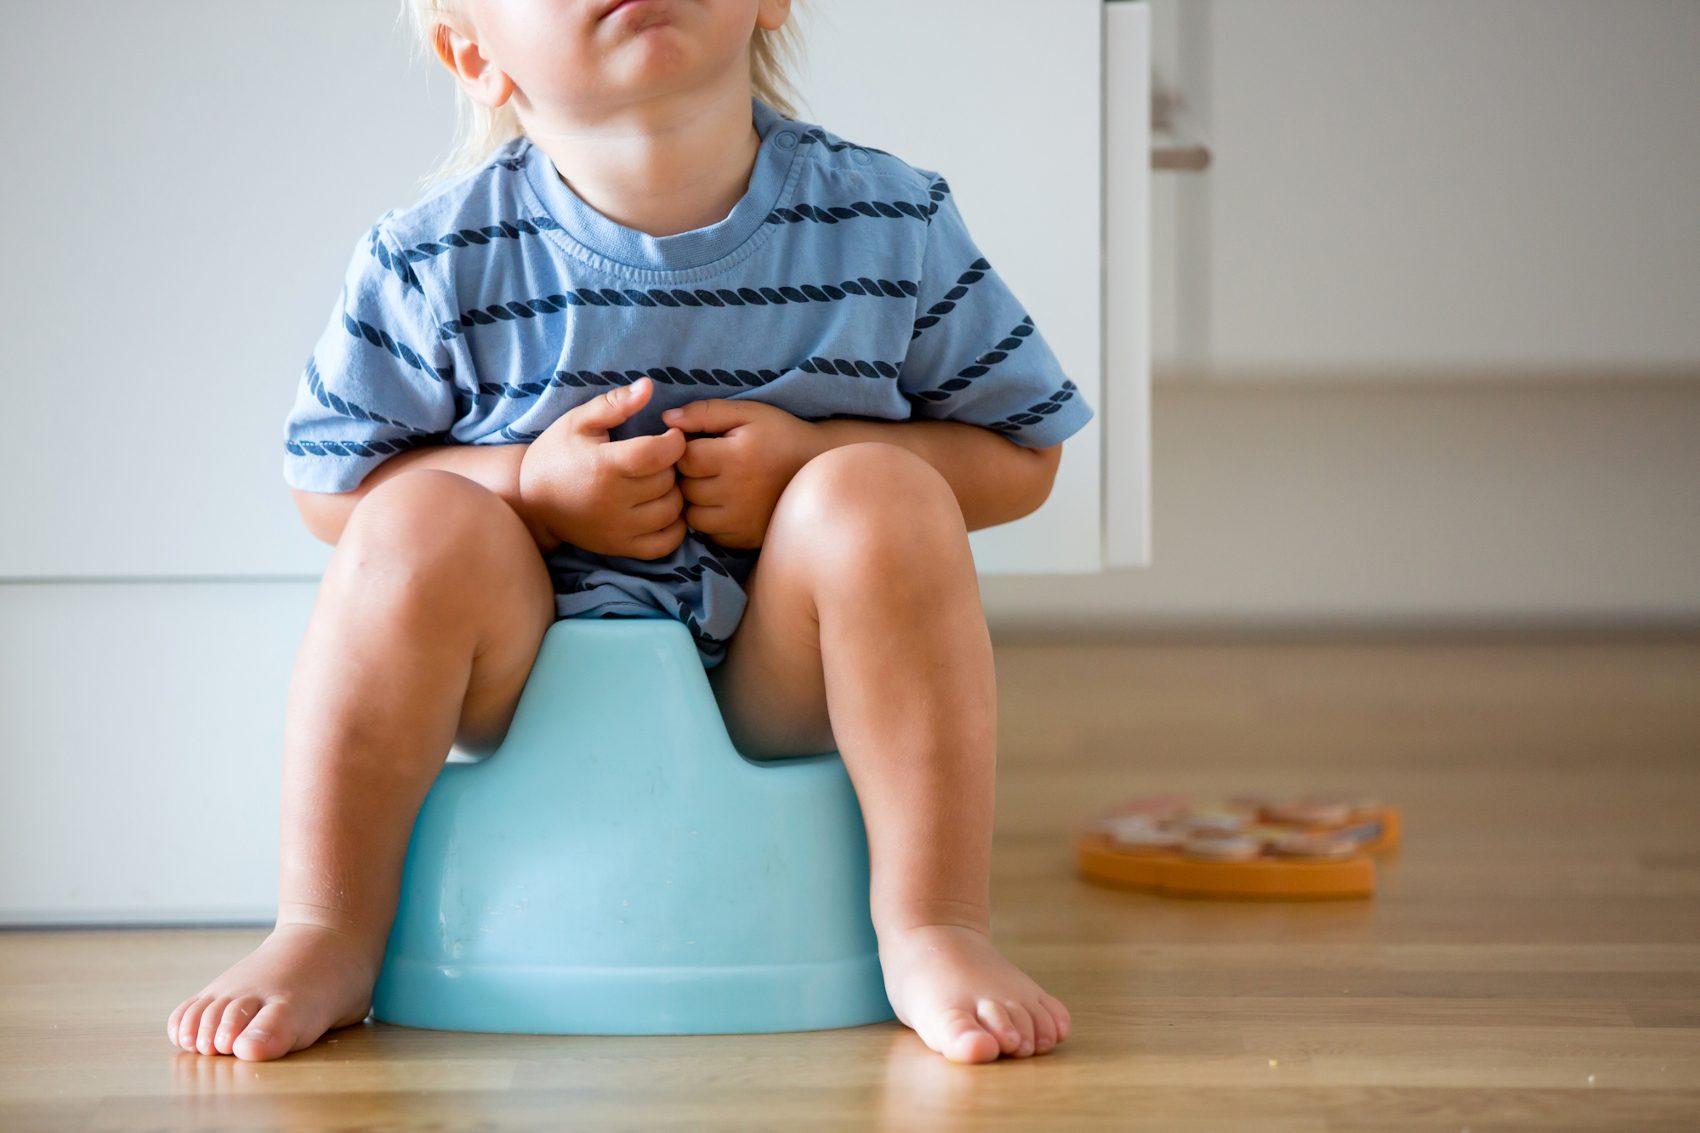 Quarantena-espannolinamento bambino seduto sul vasino